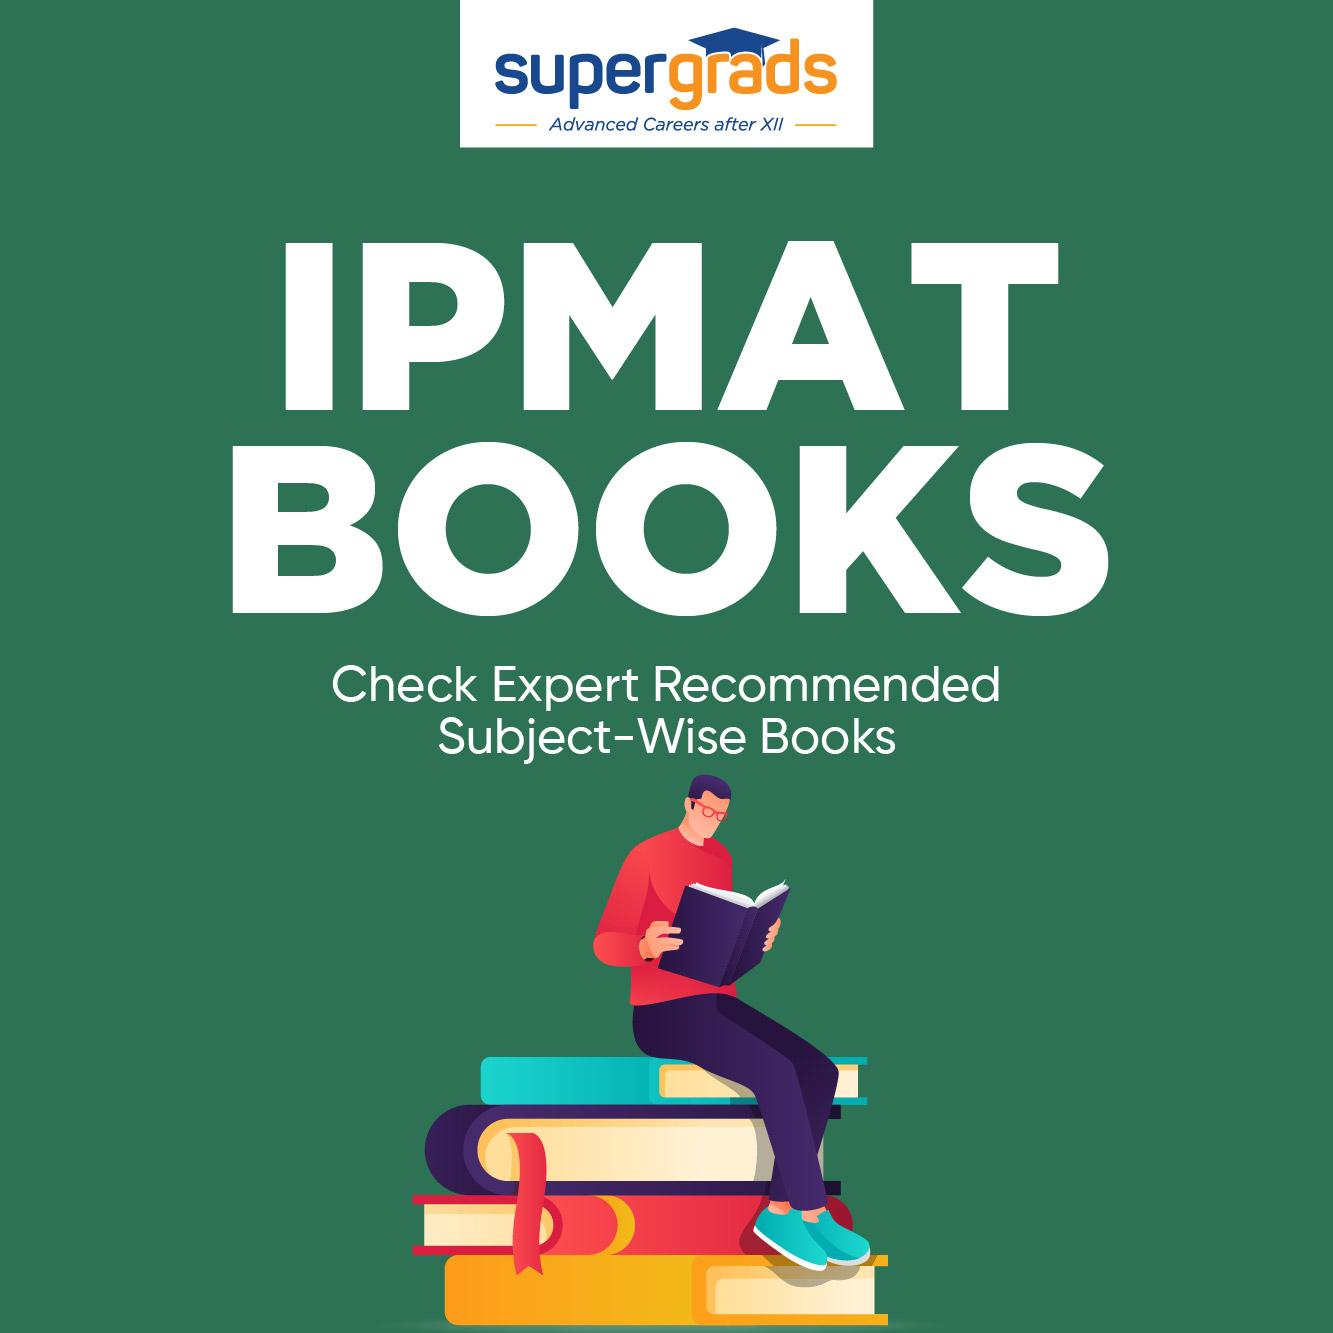 IPMAT books